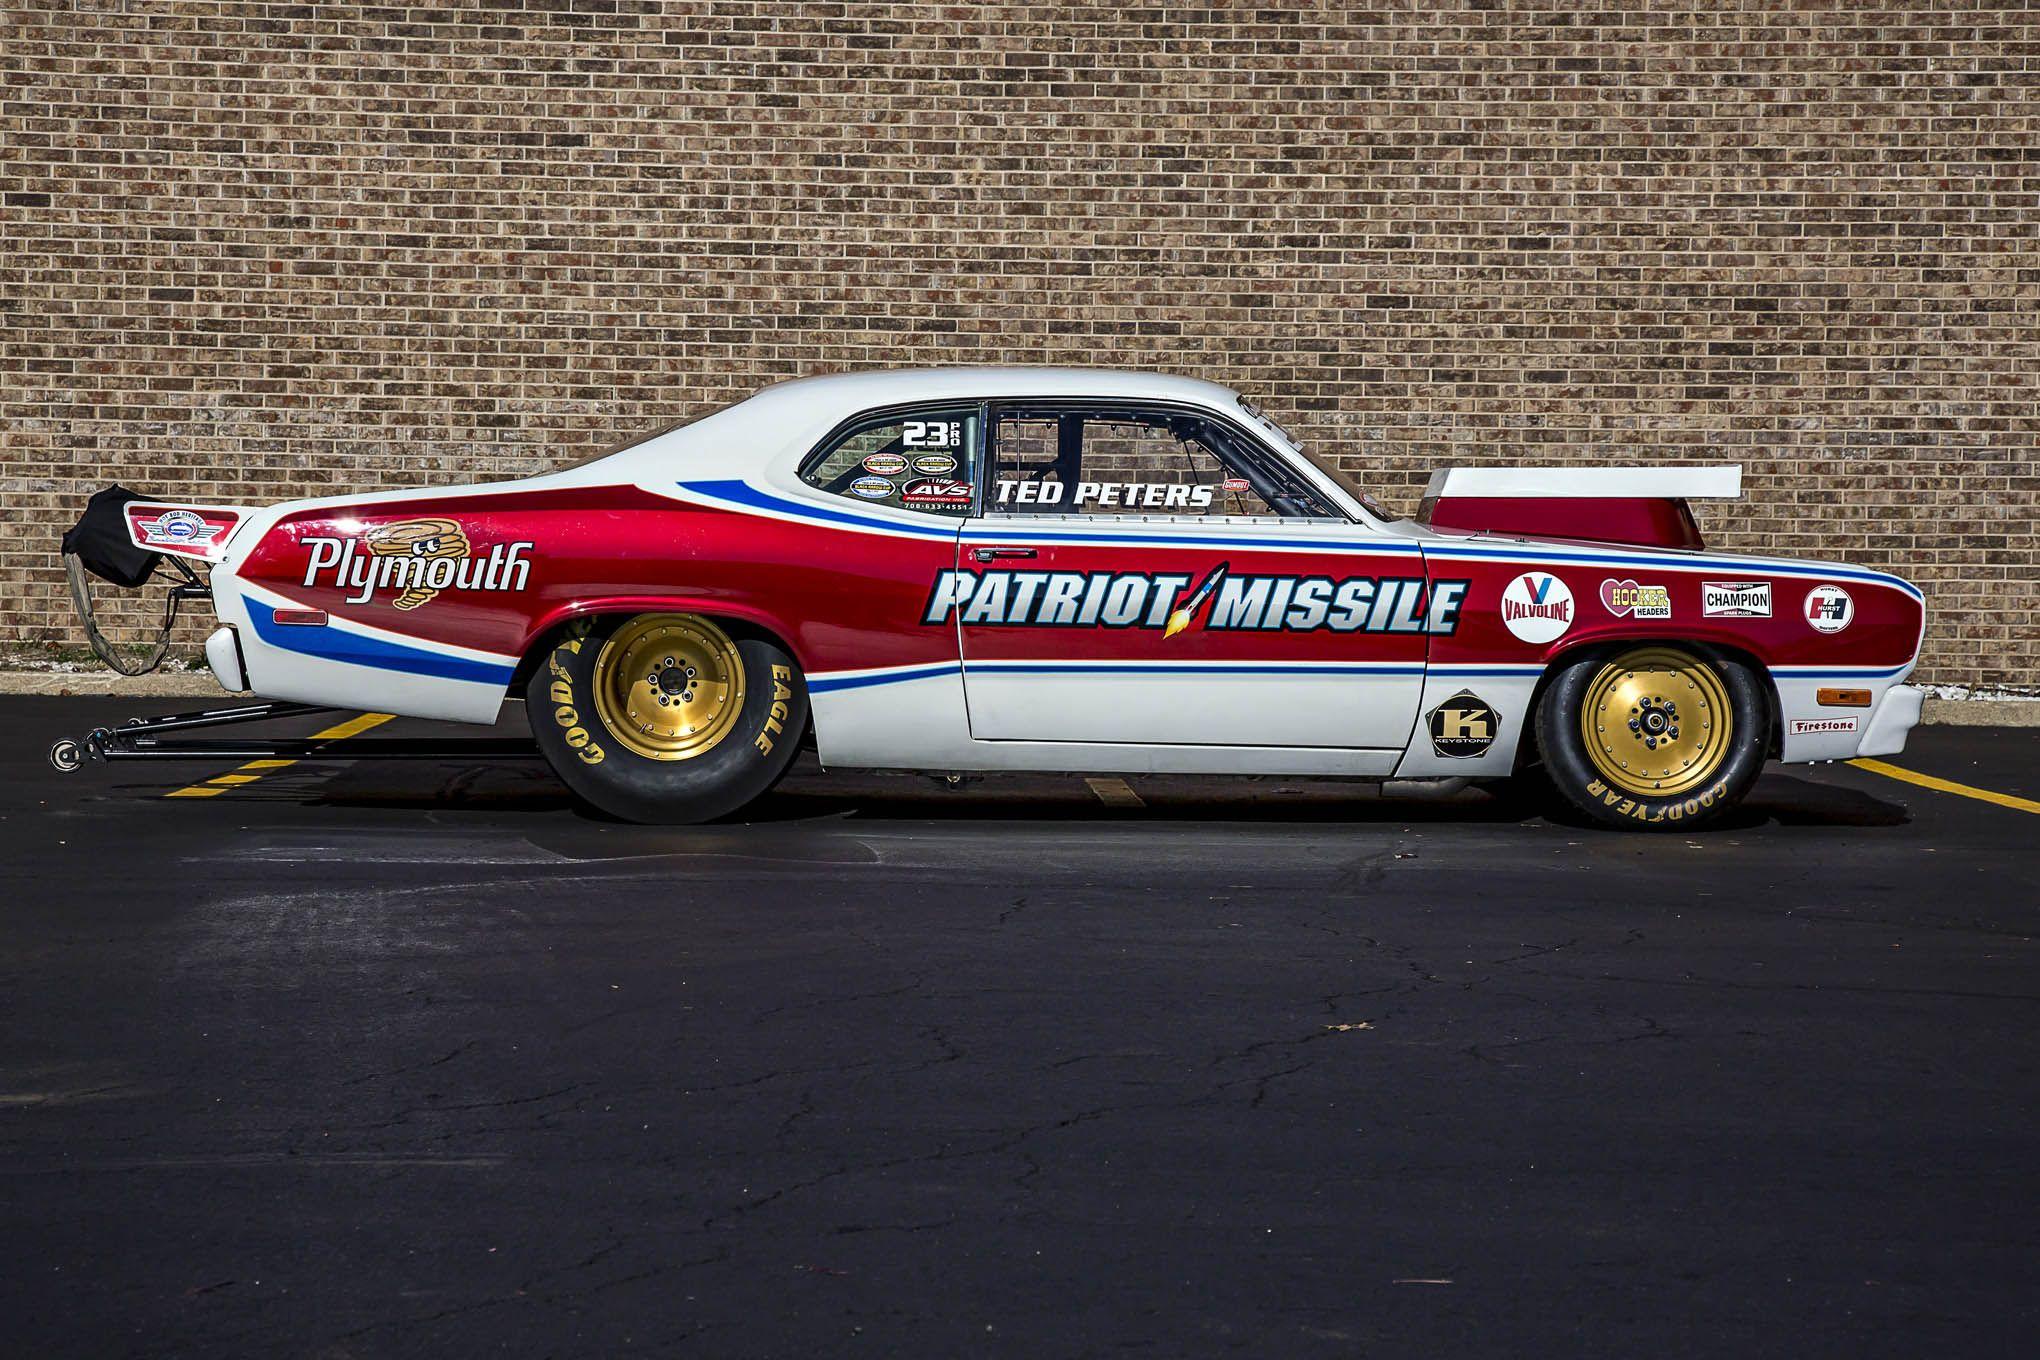 021-midwest-nostalgia-pro-stock.jpg (2040×1360) | Drag racing ...